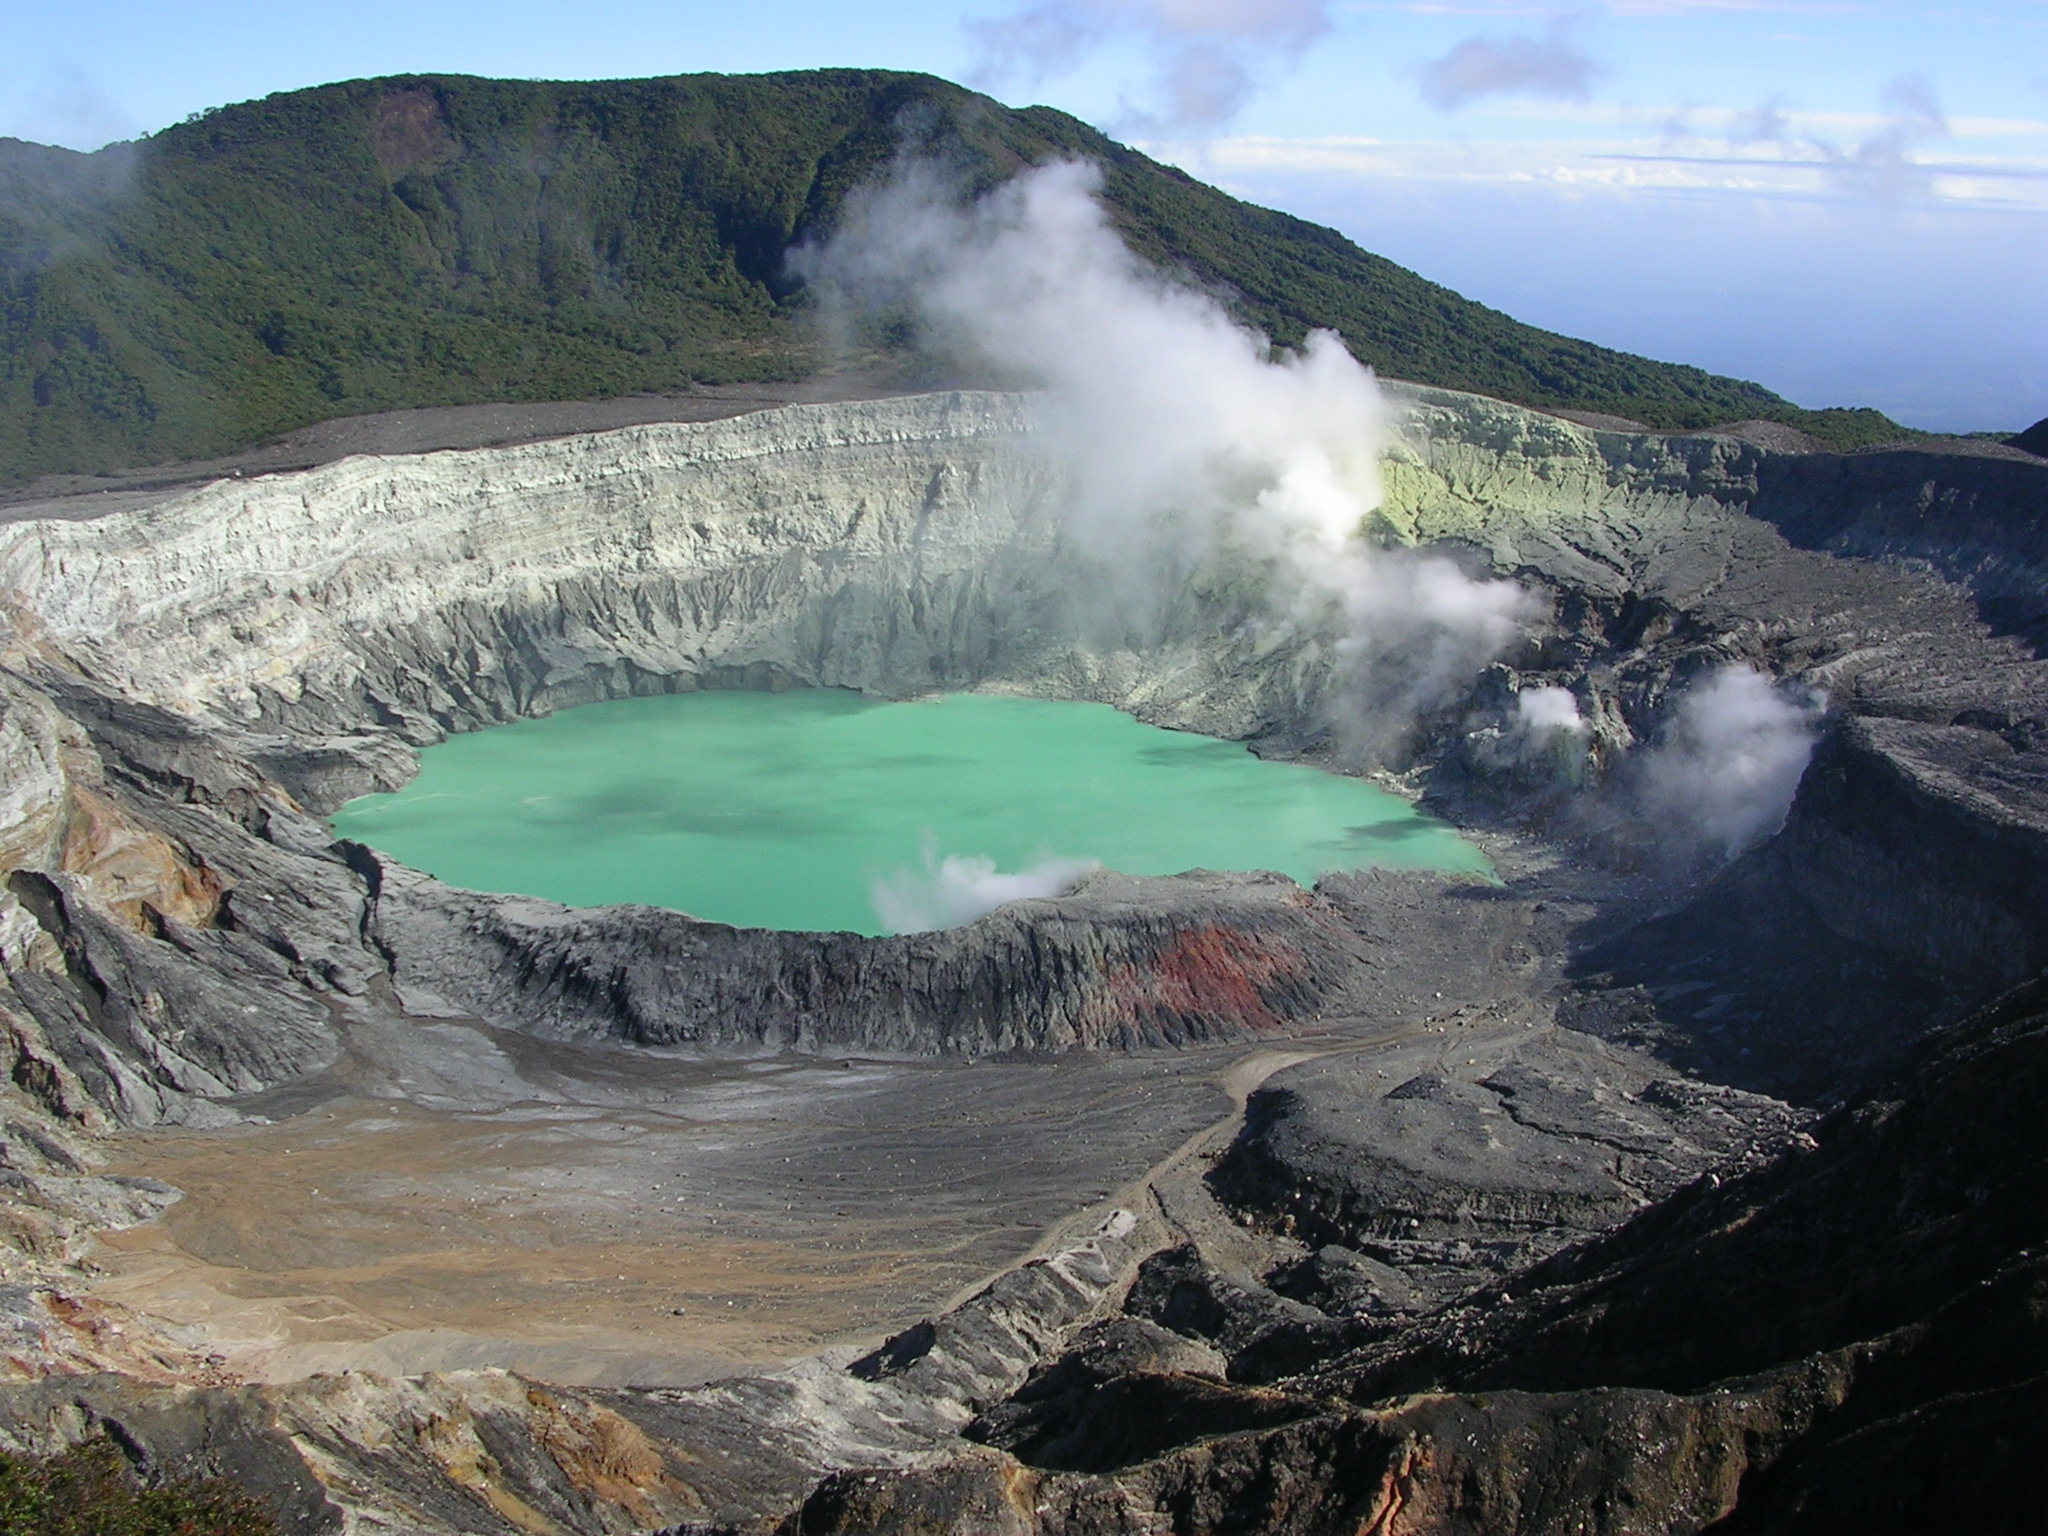 Costa Rica Arenal Volcano Tour